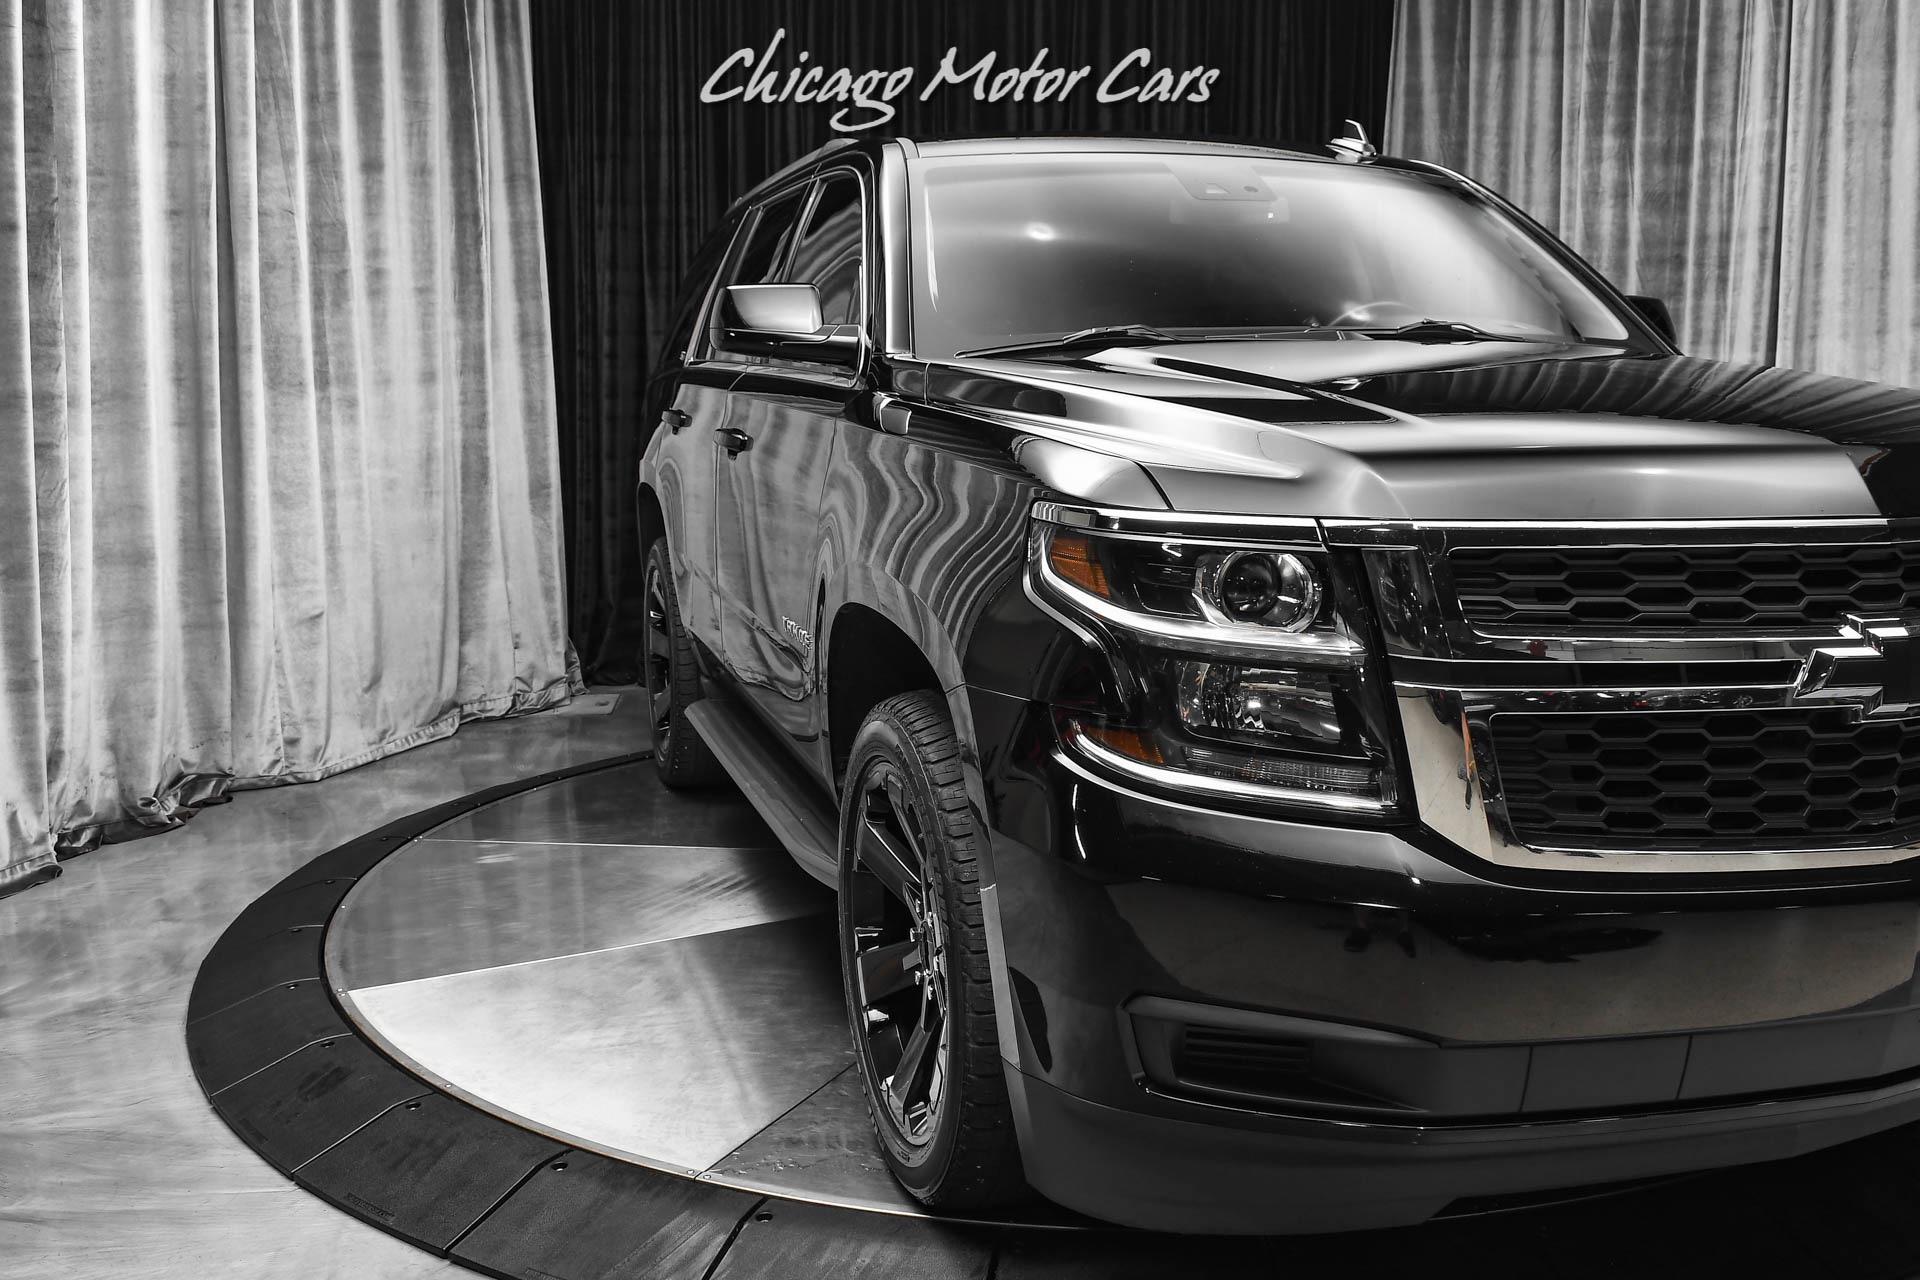 Used-2017-Chevrolet-Tahoe-LT-Max-Trailering-Package-Suspension-Package-Loaded